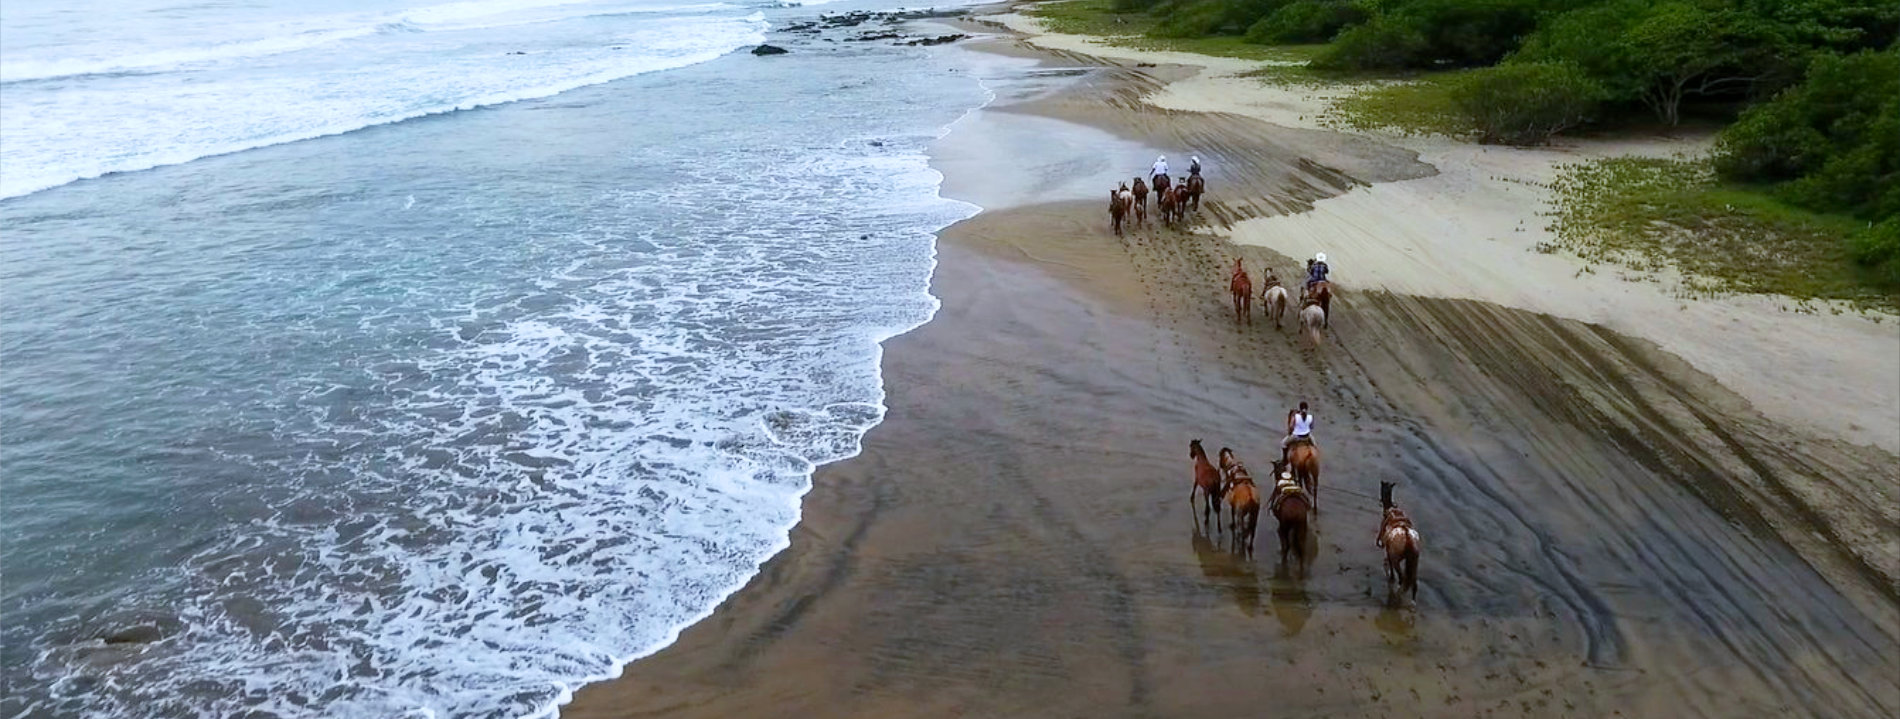 discover troncones saladita majahua mexico playa reservaciones hospedaje ixtapa guerrero travel near me booking hotel cheap hotel beach